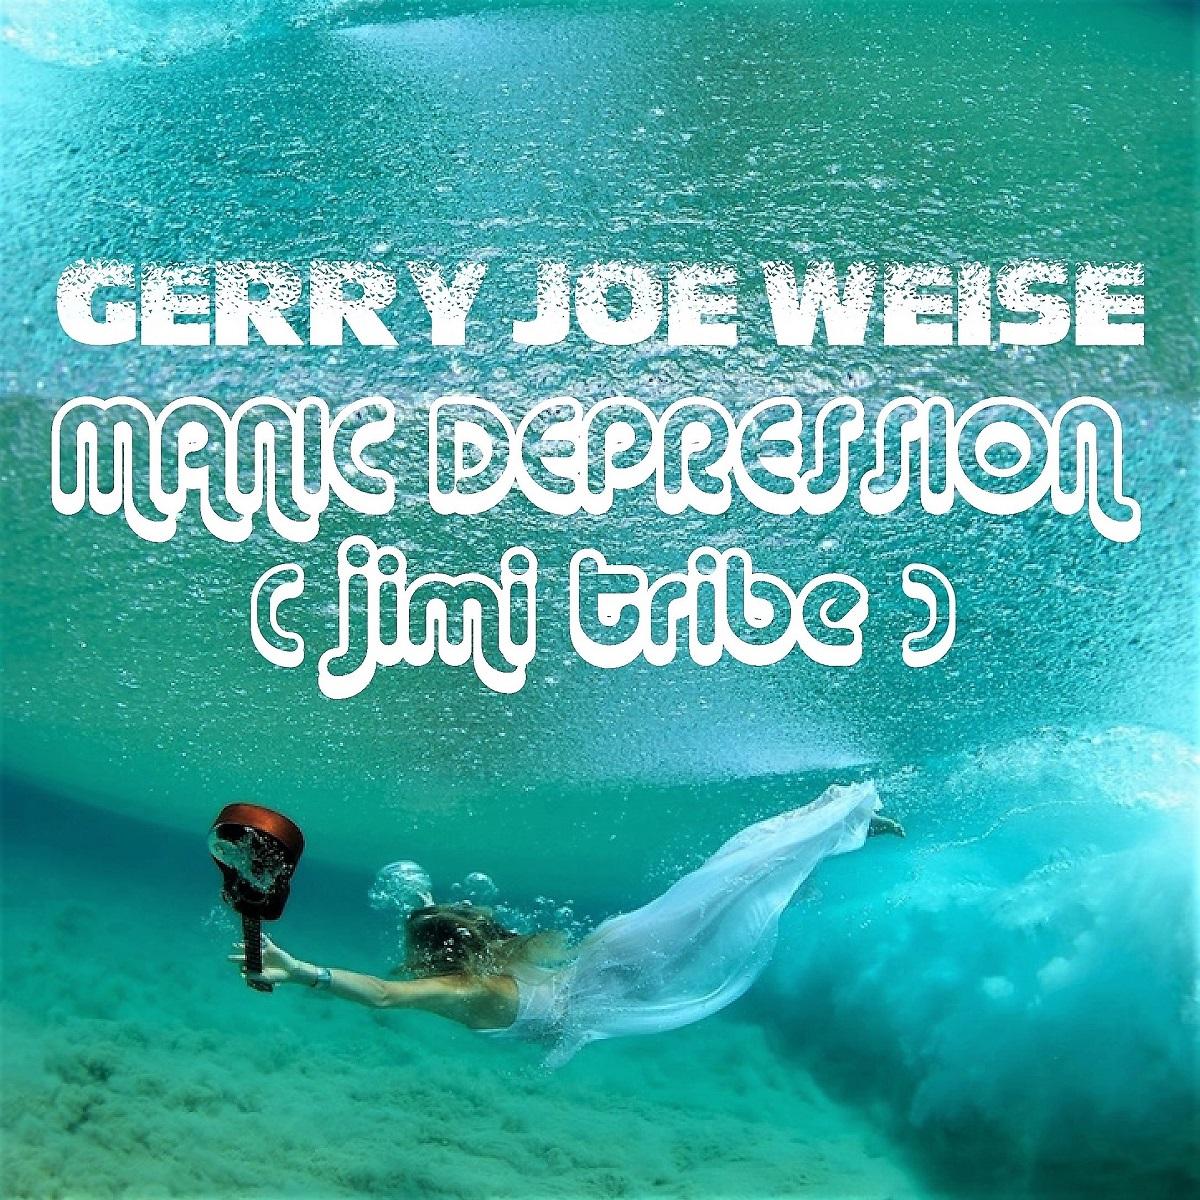 Manic Depression (Jimi Tribe), 2018 single EP